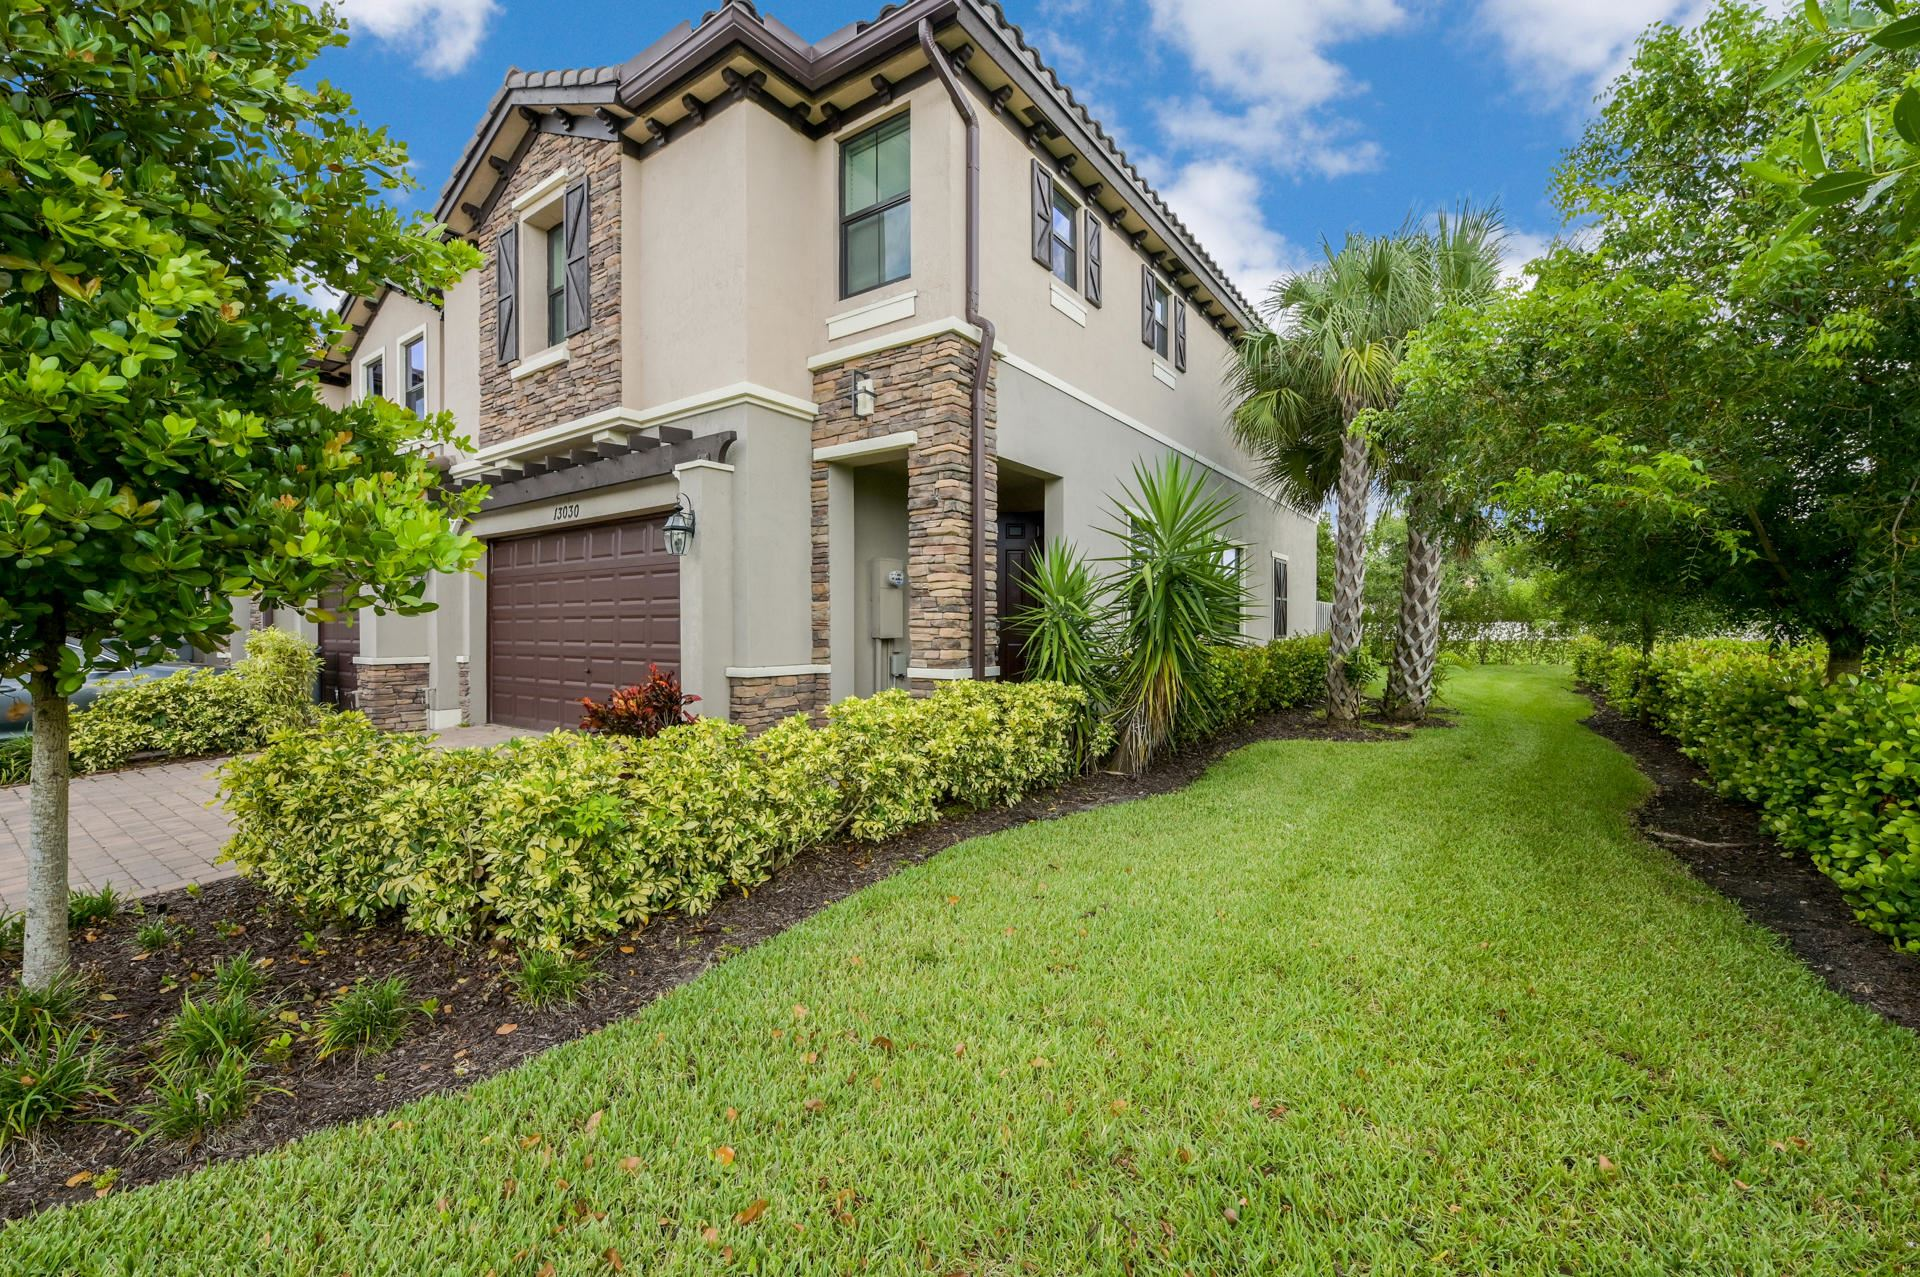 13030 Anthorne Lane, Boynton Beach, FL 33436 - #: RX-10635946